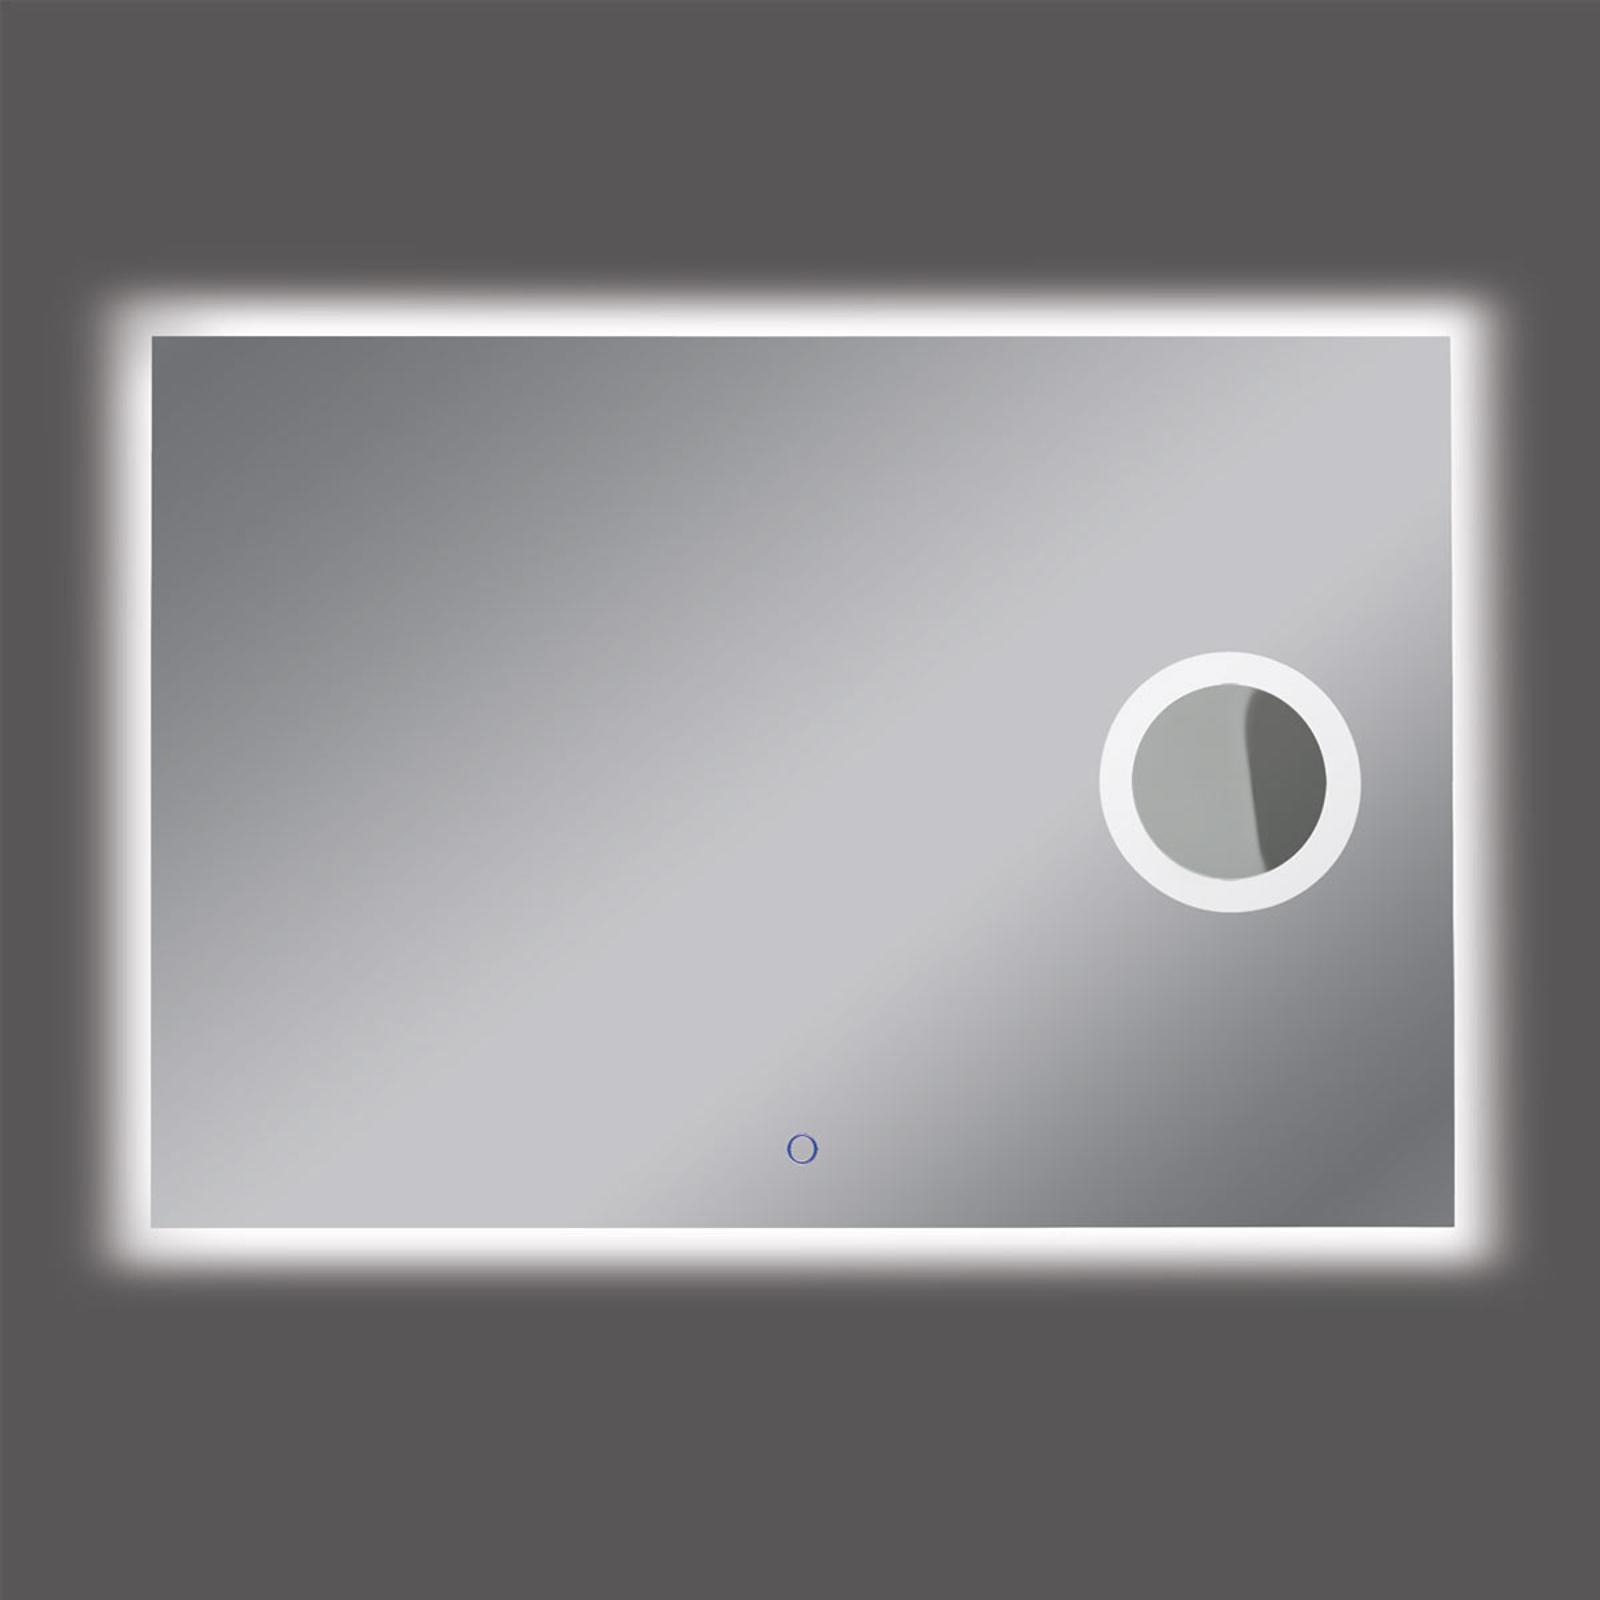 LED-Wandspiegel Olivia, 110x75 cm, 4.000 K, Lupe